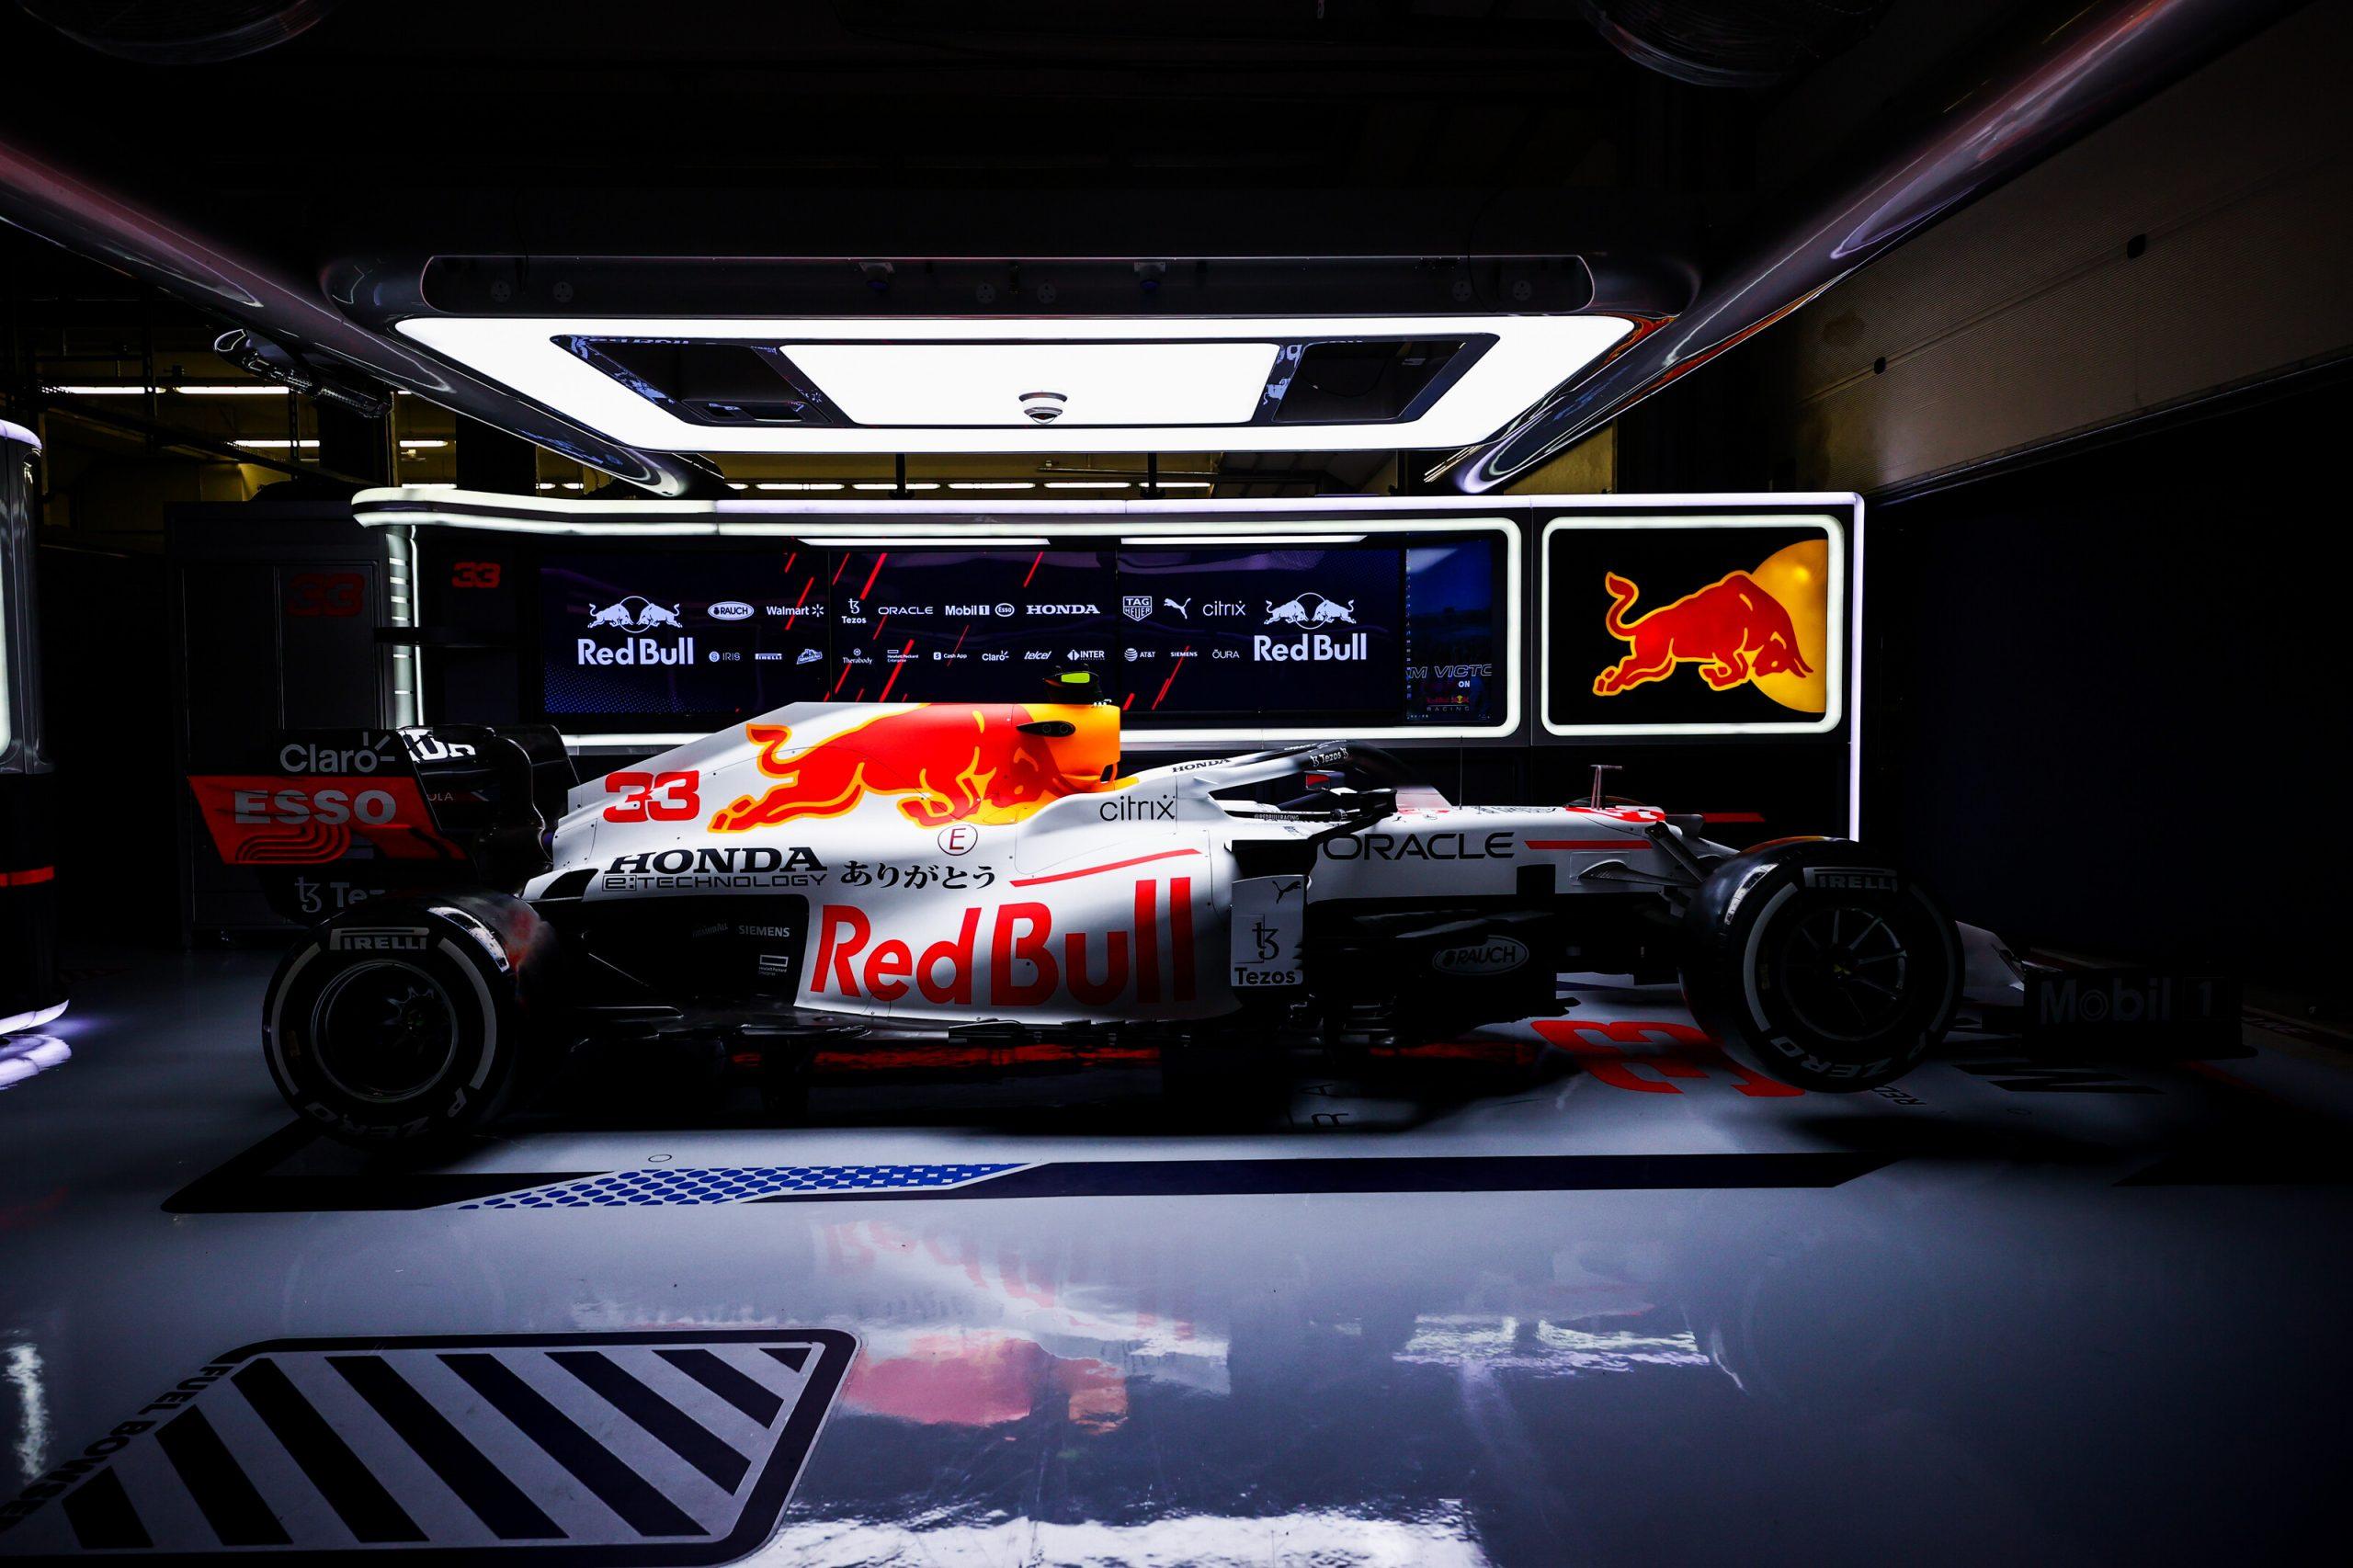 F1, Rivelata la nuova livrea Red Bull.